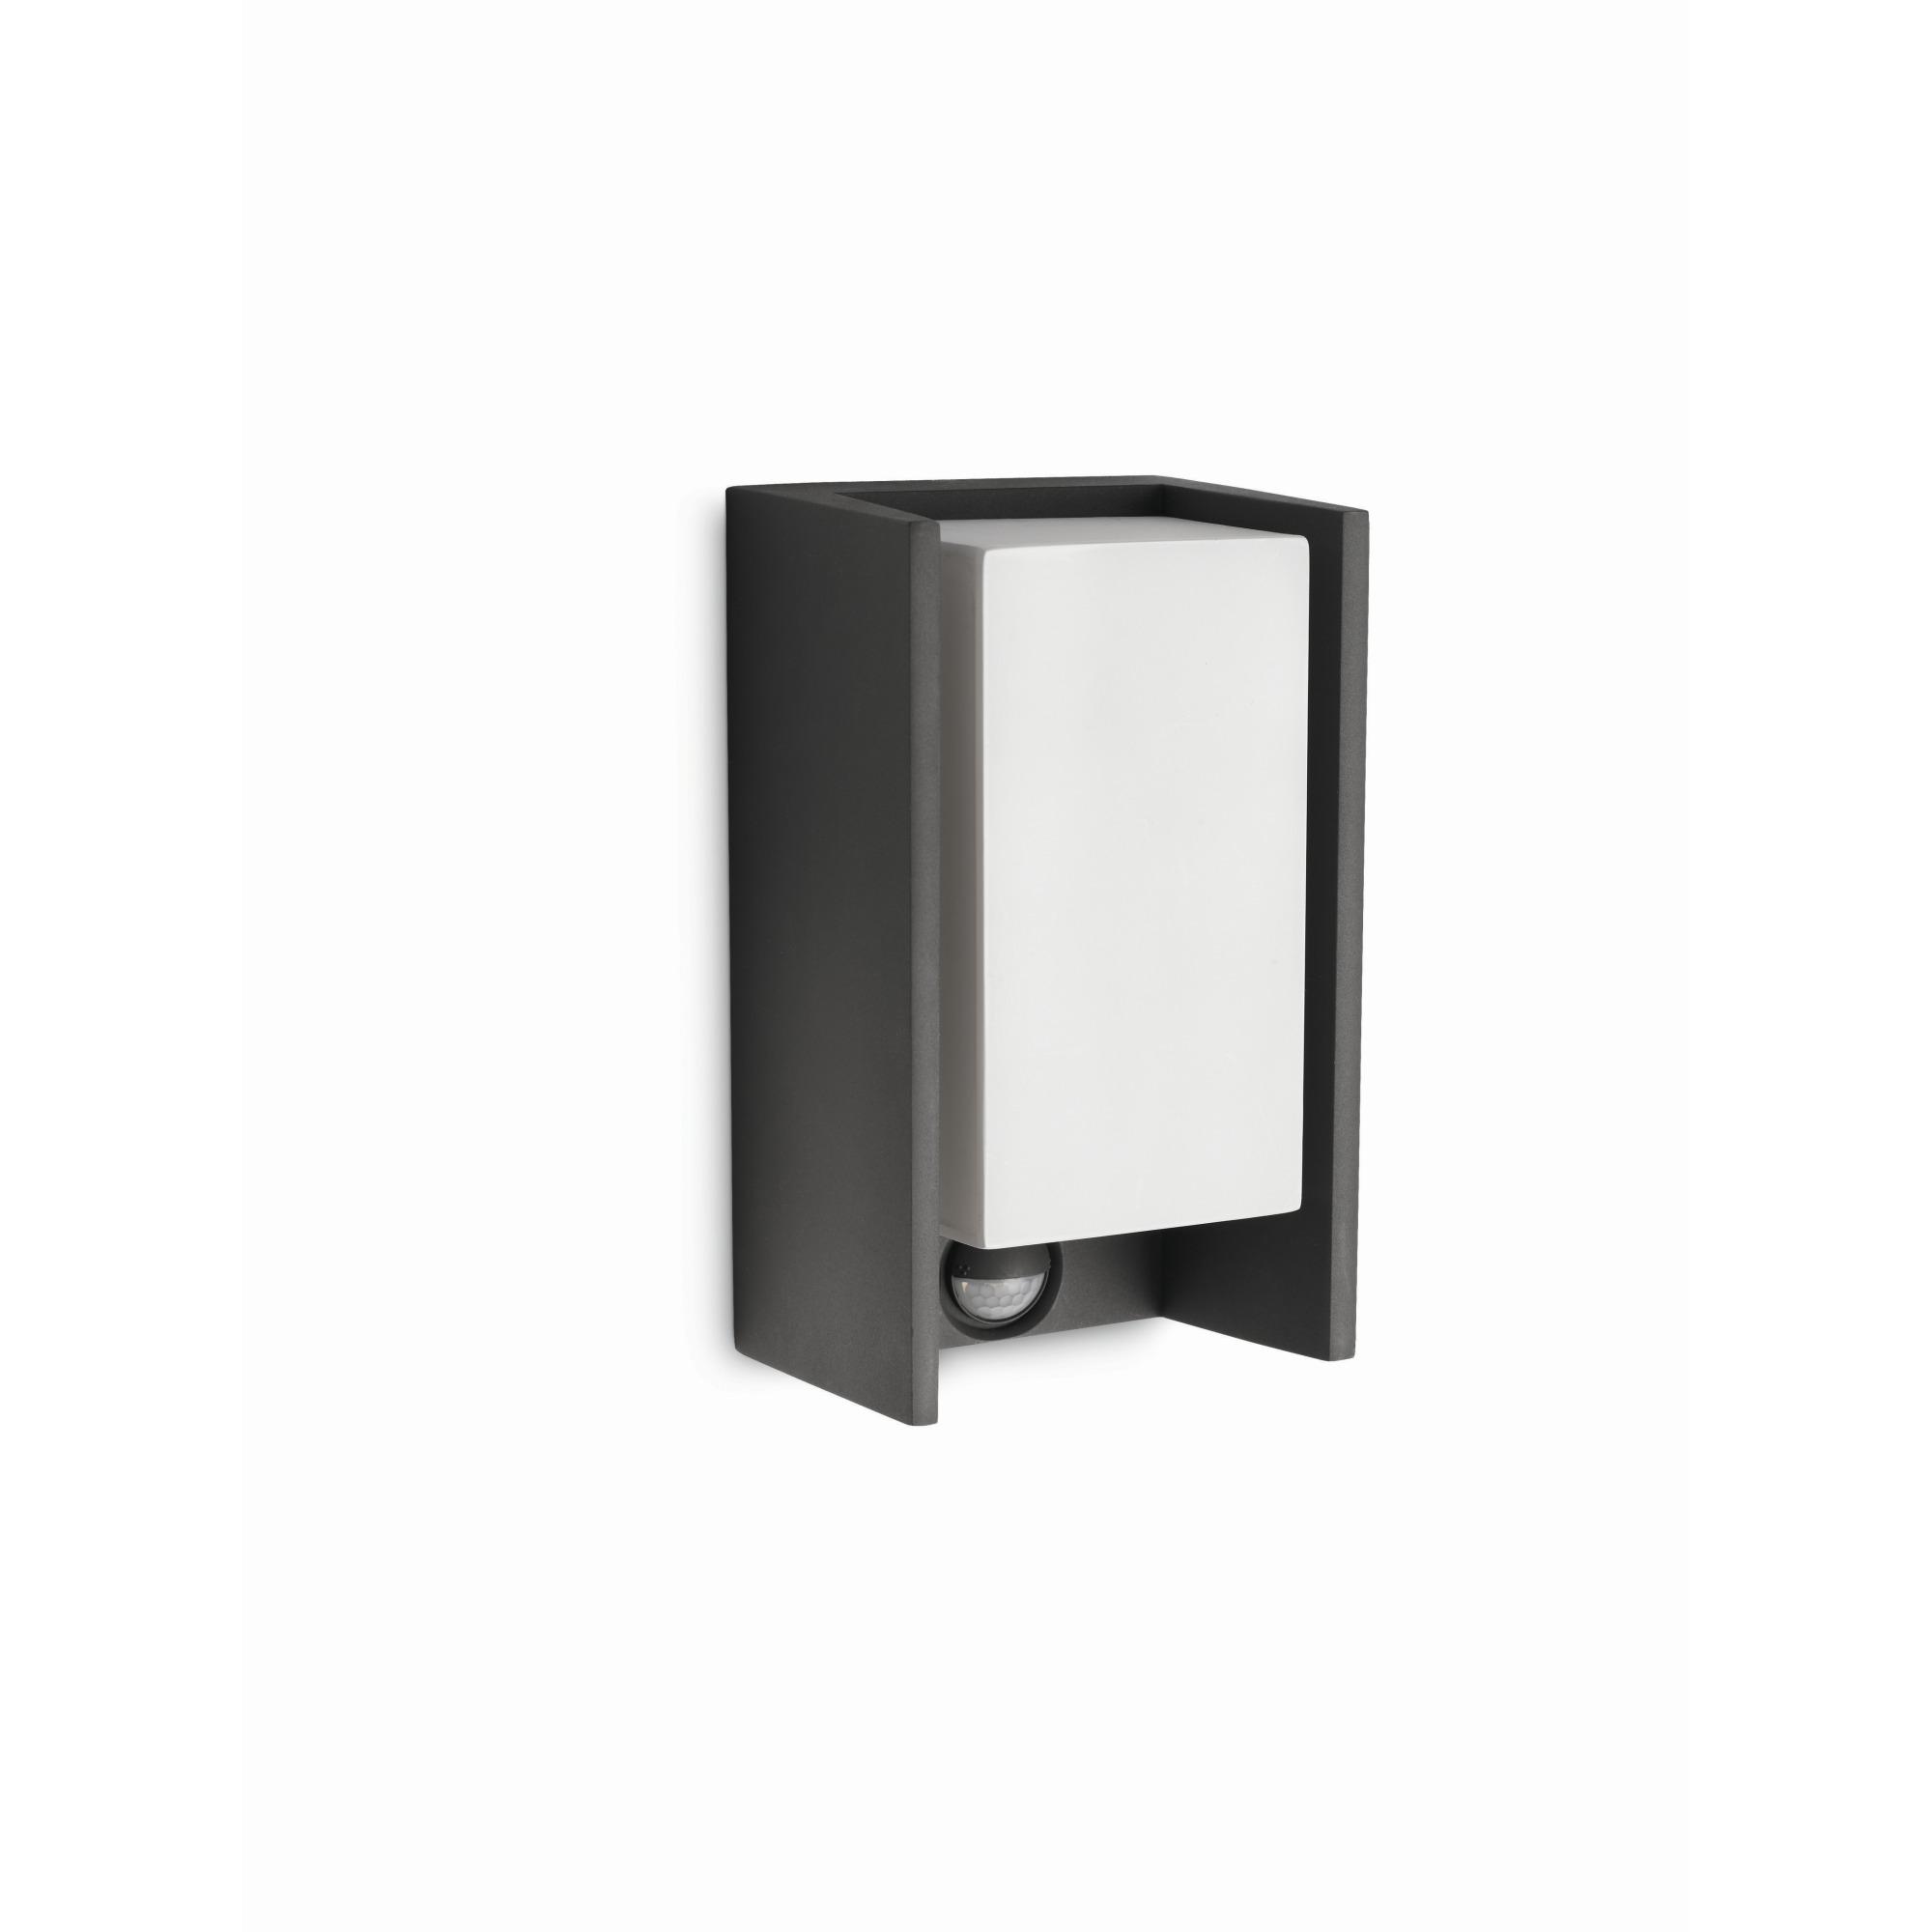 energie A+, Energiebesparende buitenwandlamp met IR-sensor, Philips